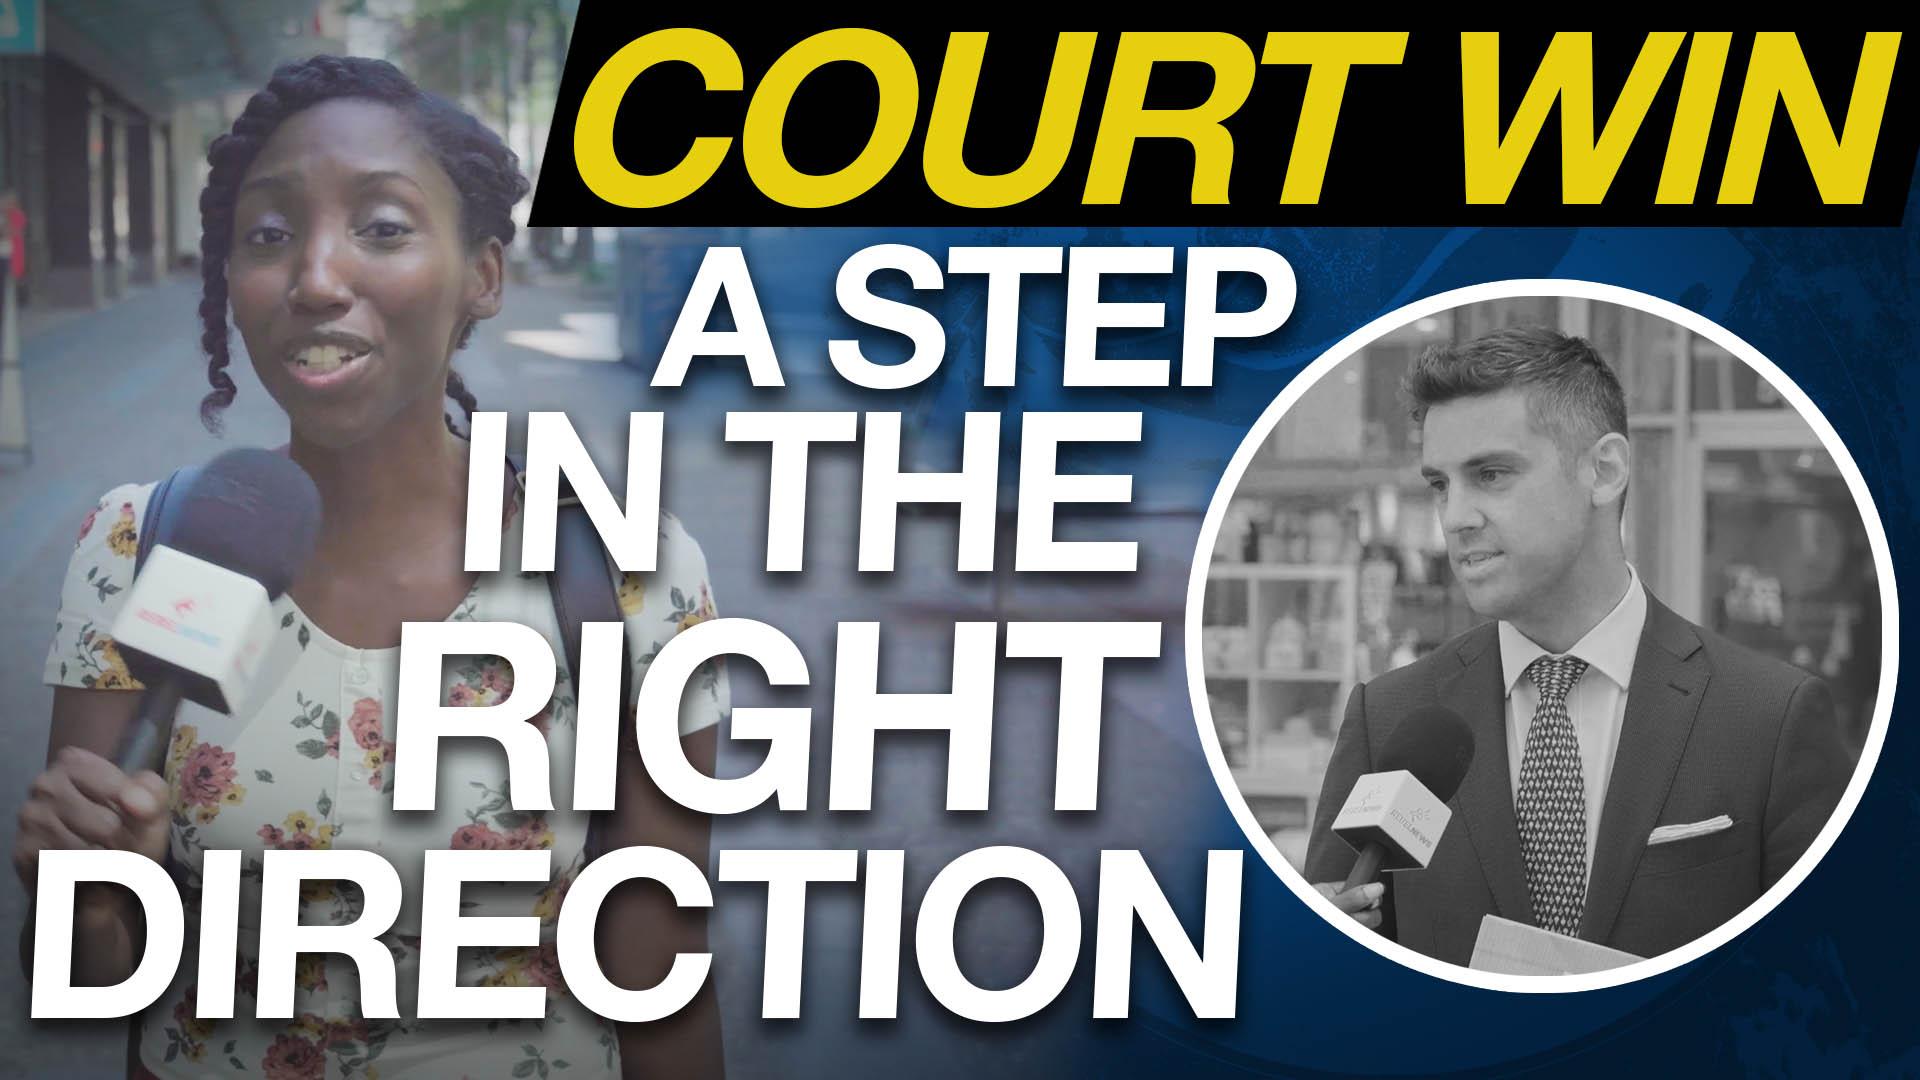 VICTORY: Rebel News wins court case on restrictive publication ban